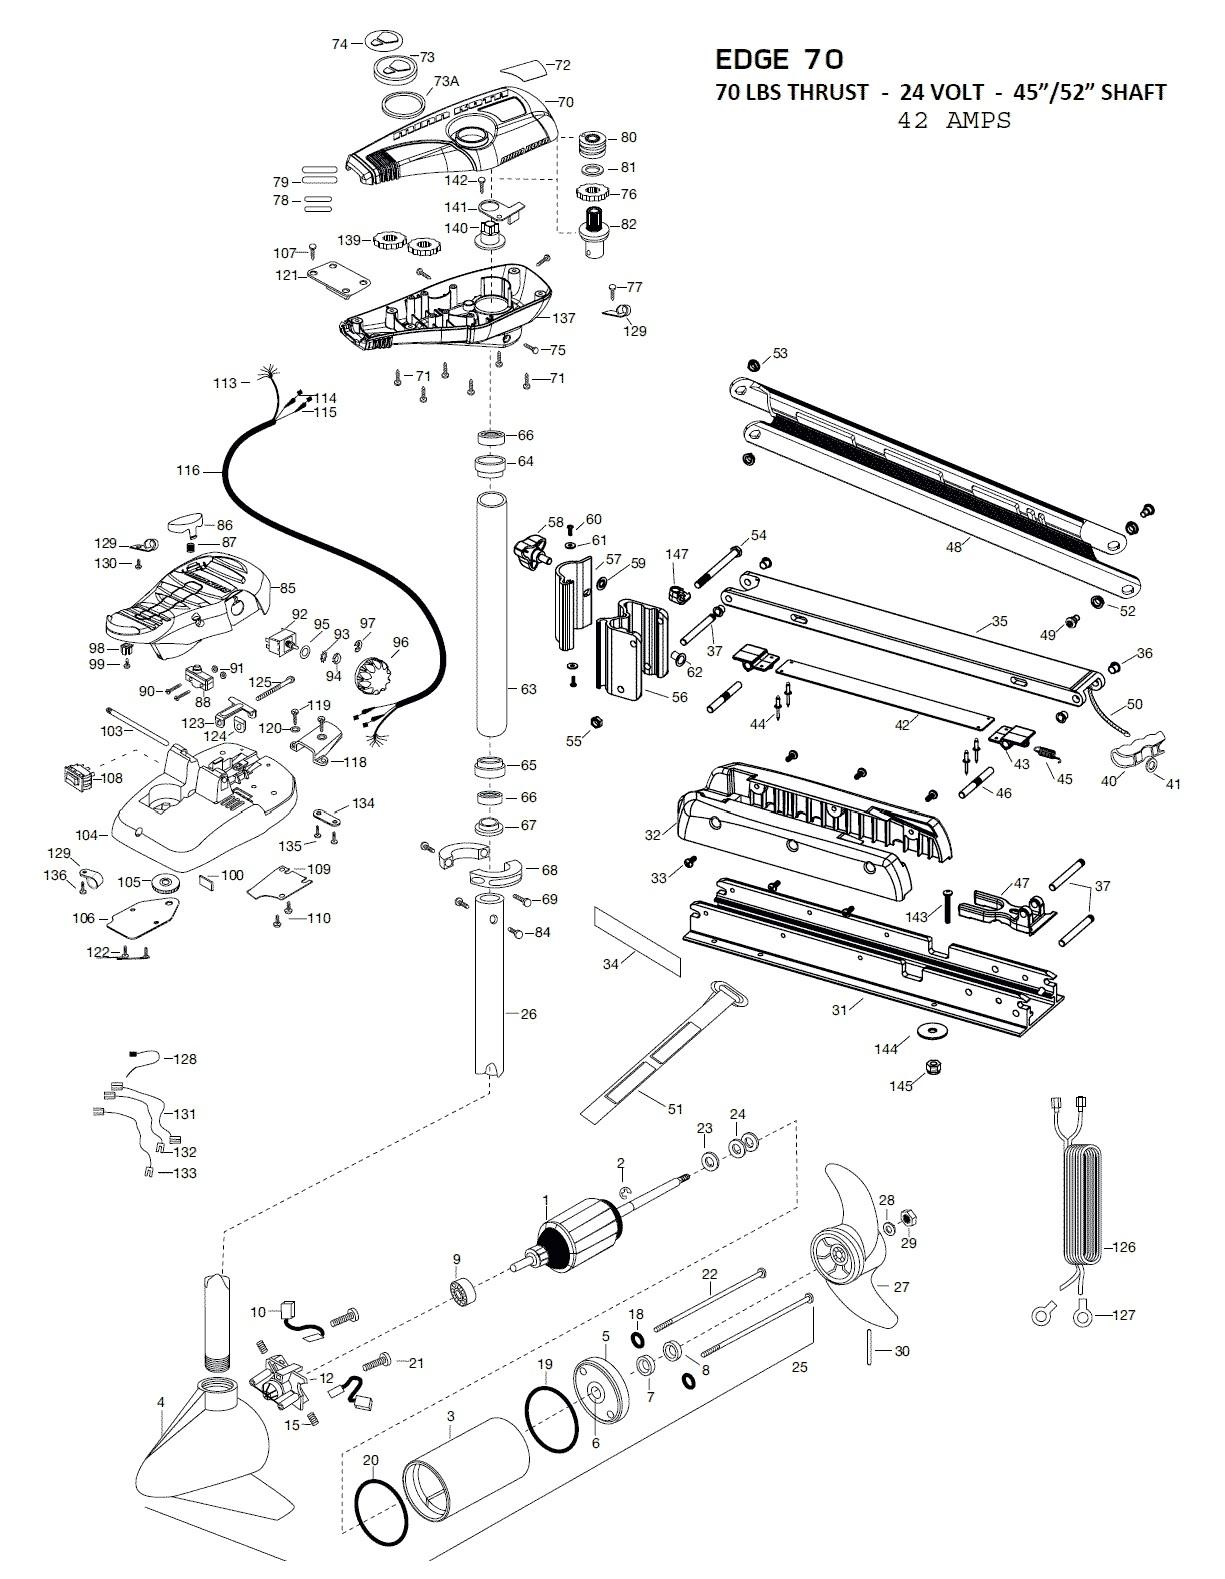 minn kota edge 70 wiring diagram wiring diagrams list rh 17 nmtre spedition geiss de